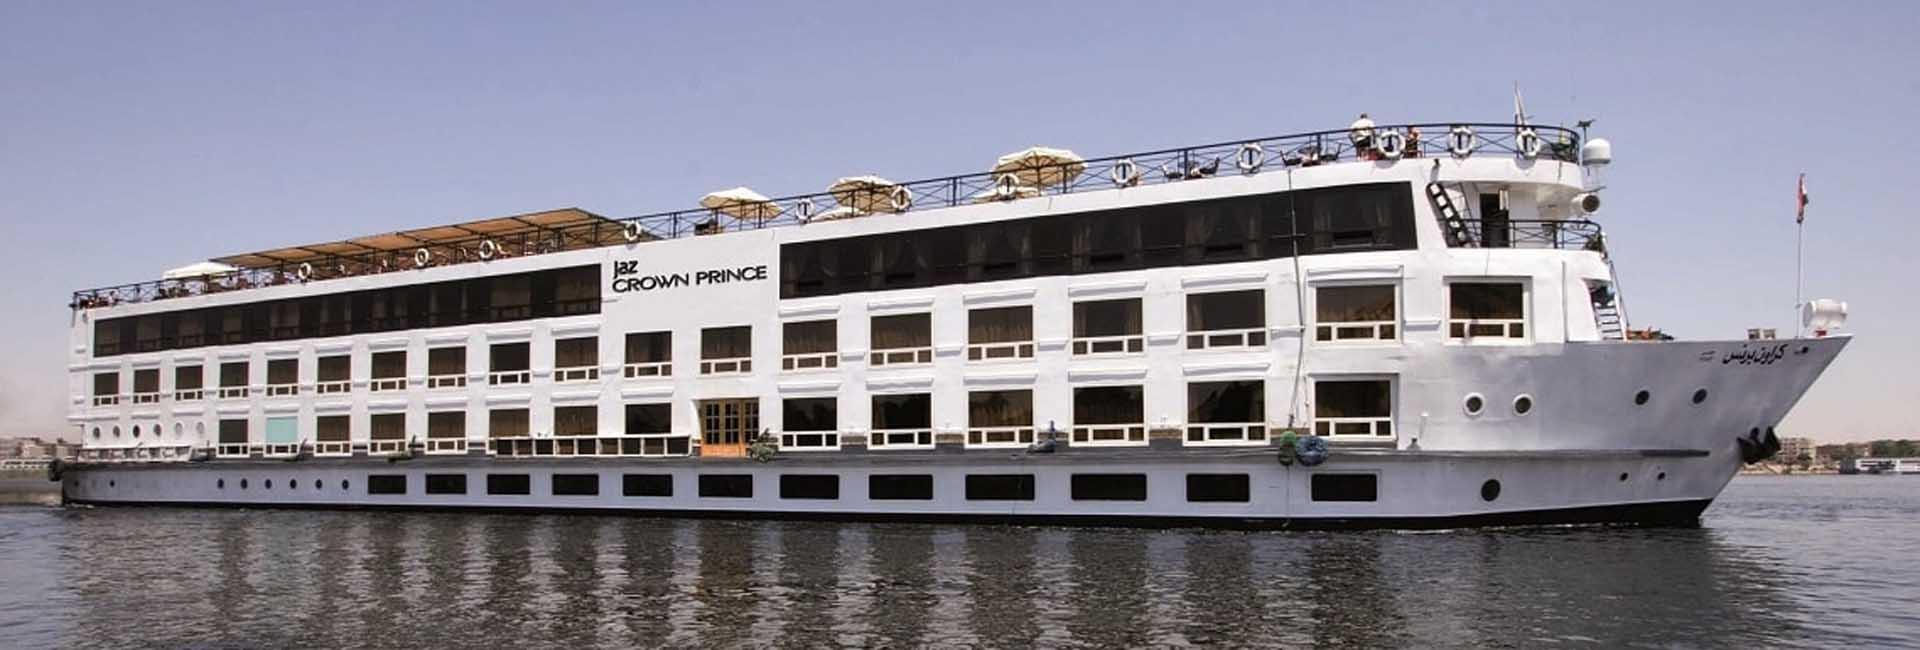 Crown Prince Nile Cruise